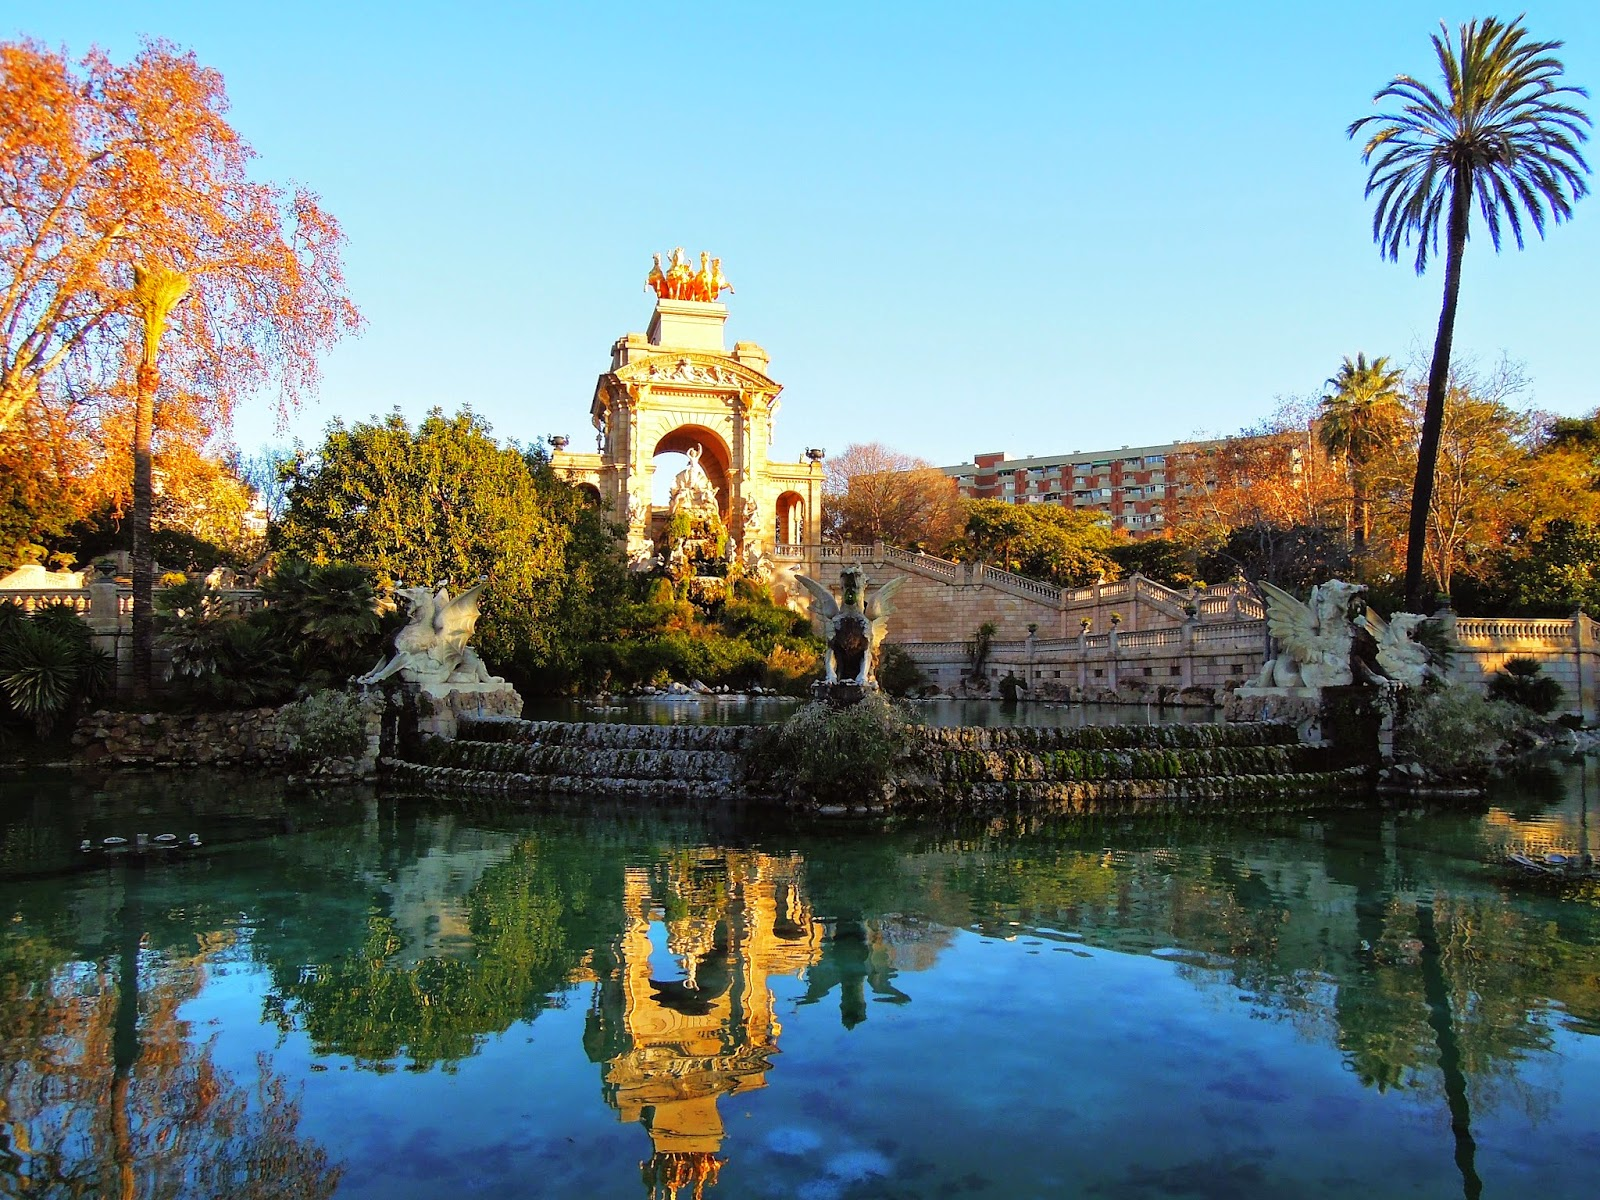 La Fontana monumentale dentro il Parc de la Ciutadella